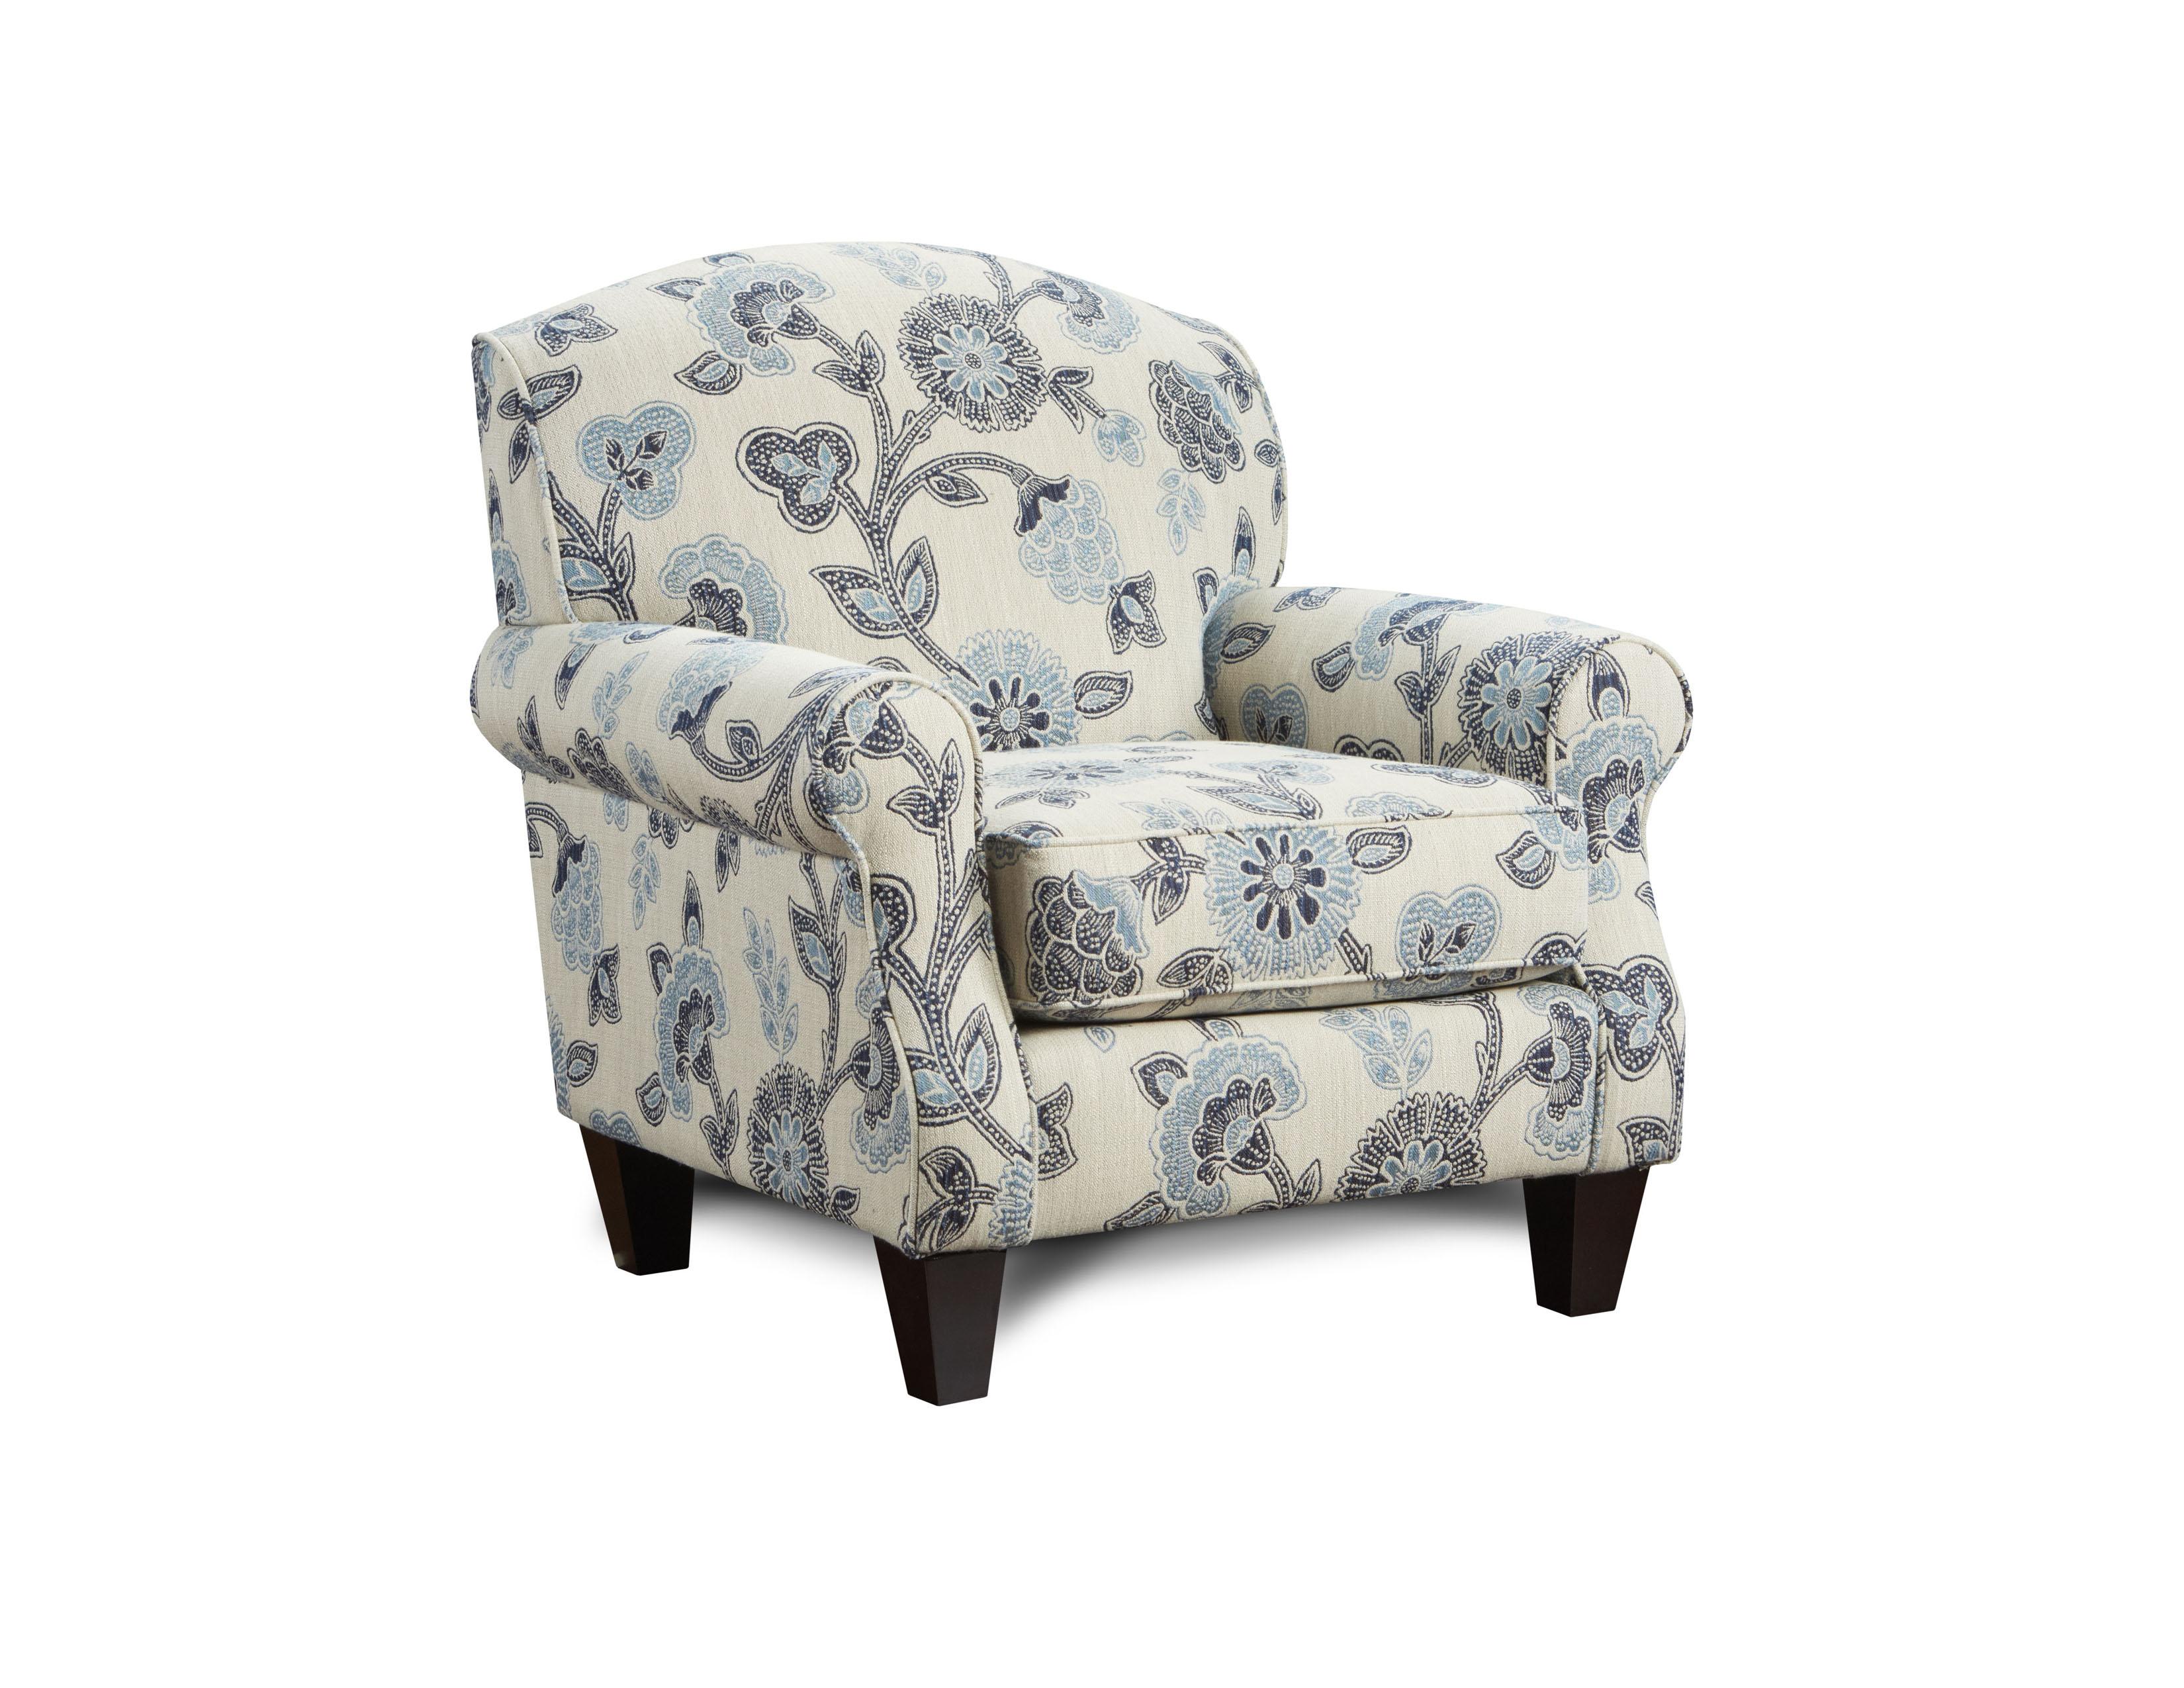 Maya Indigo Fusion Furniture chair, Catalina Linen collection